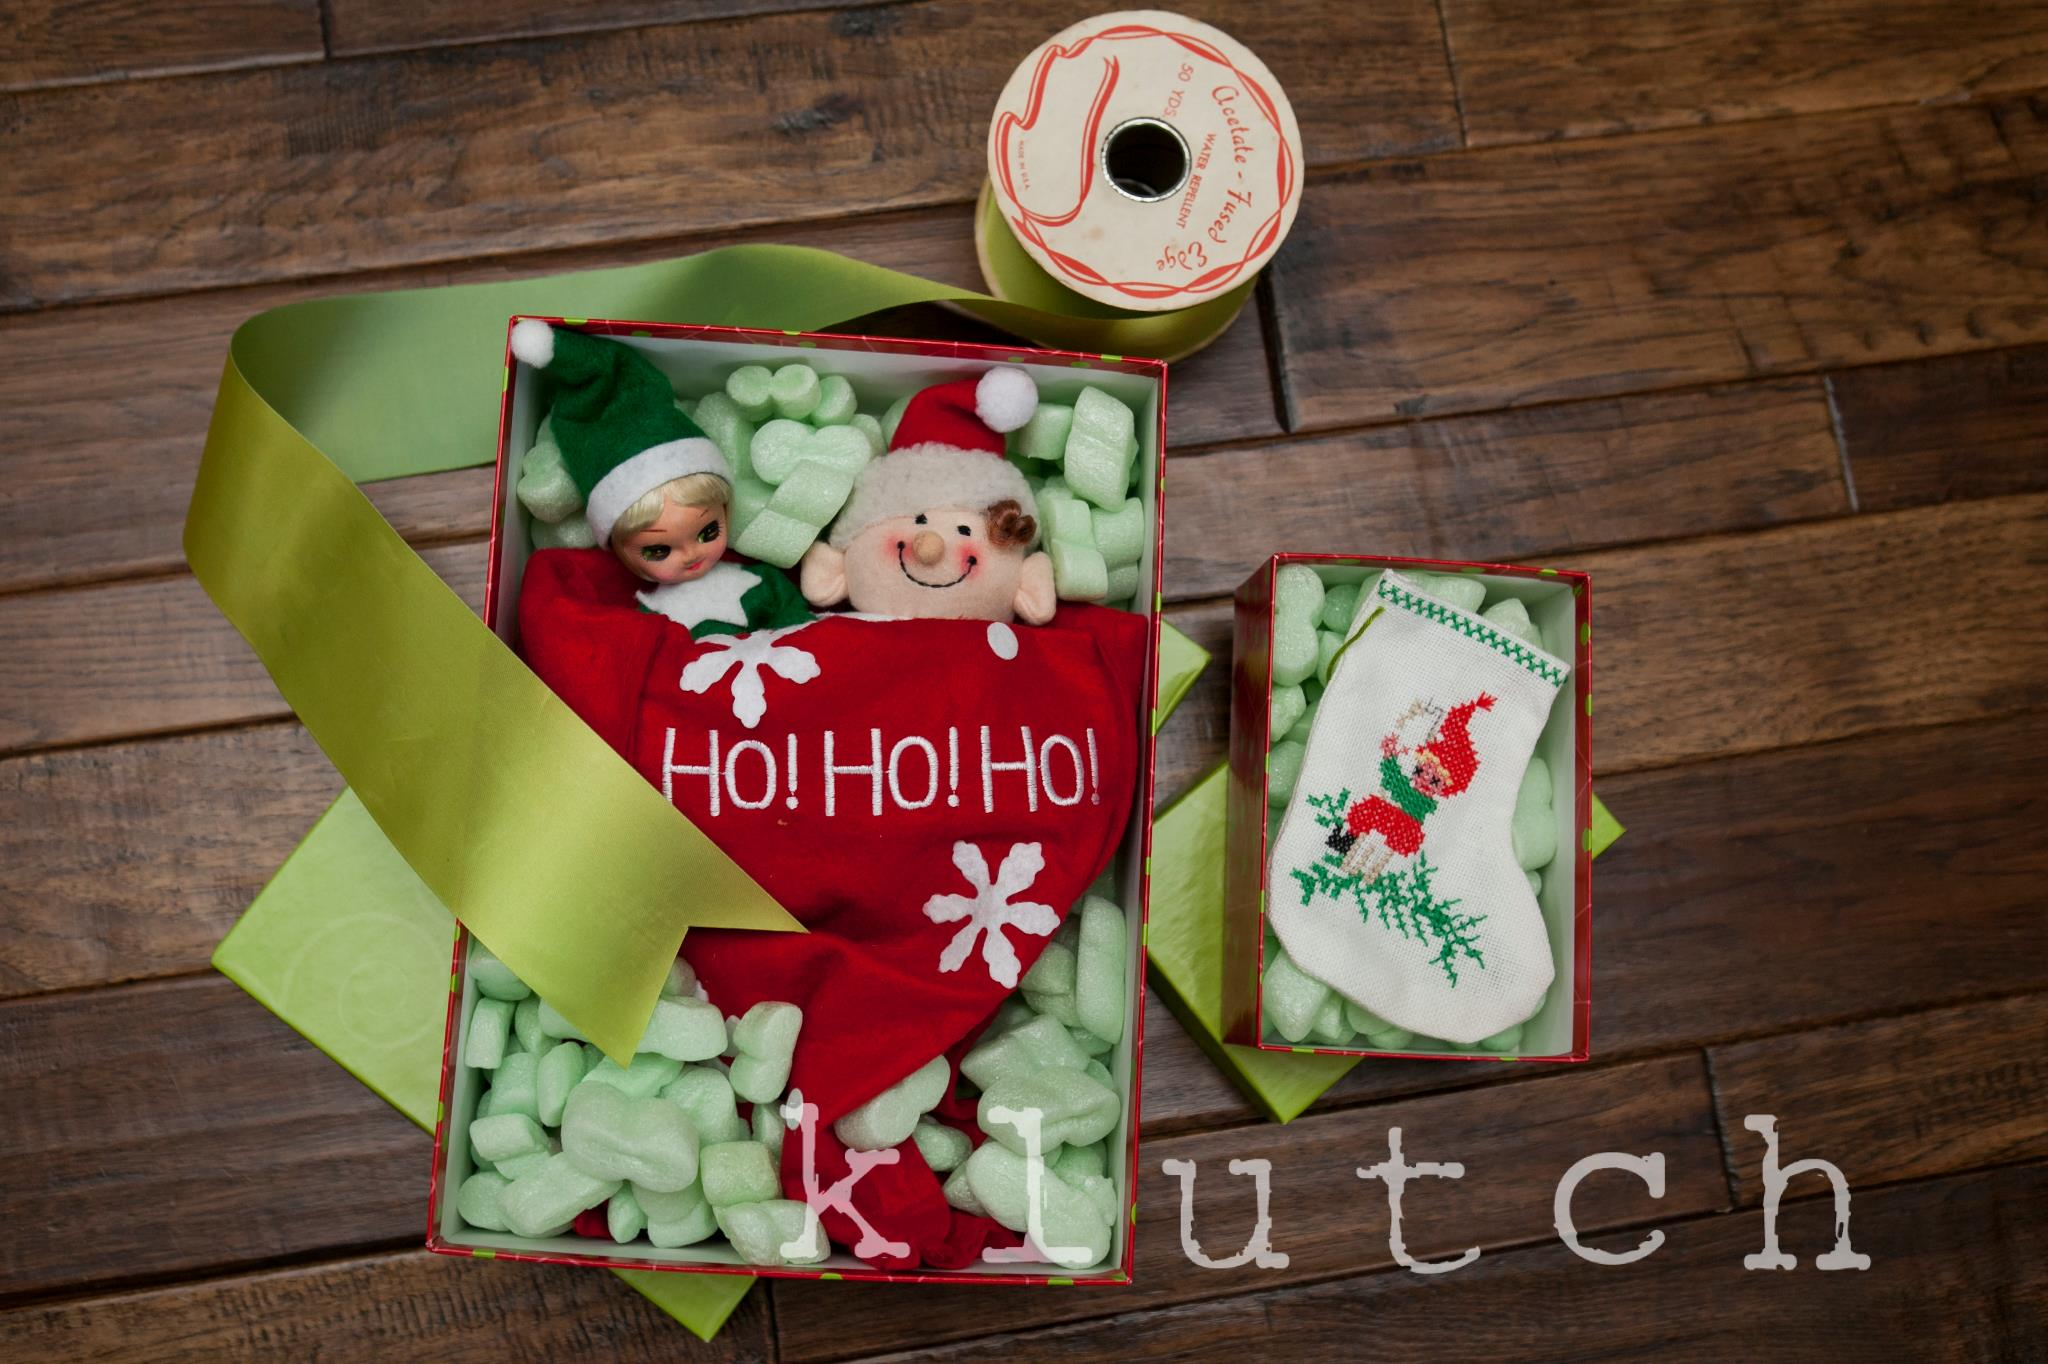 Klutch Photography, family photographer, elf on the shelf, vancouver family photographer, whiterock family photographer, lifeunscripted photographer, lifestlye photographer pp.jpg